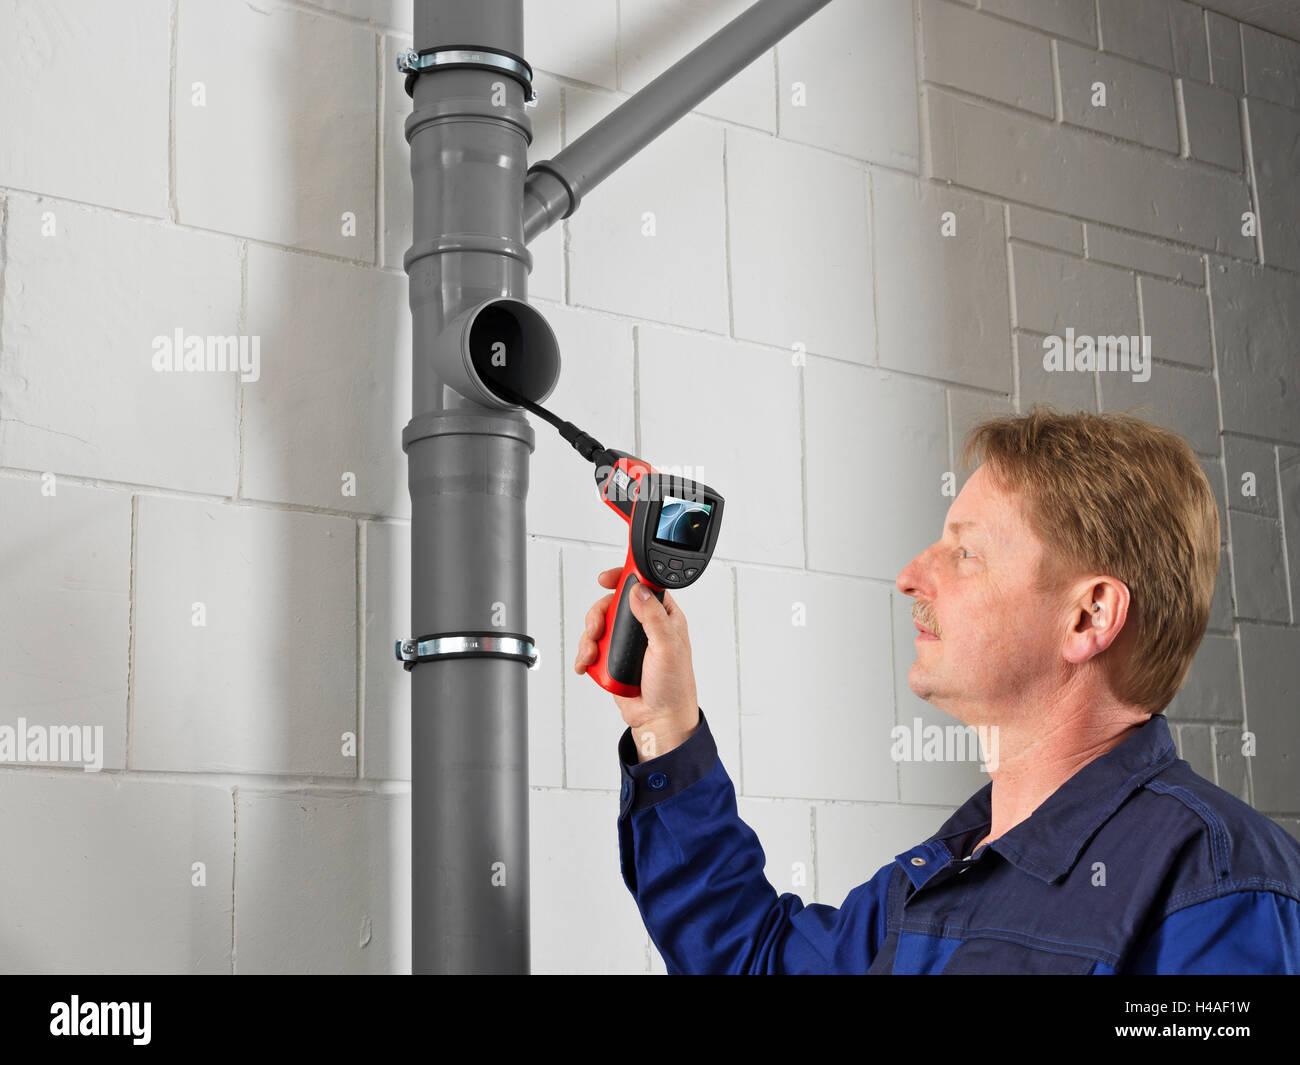 Endoscope camera, drainpipe, blocked, check, man - Stock Image